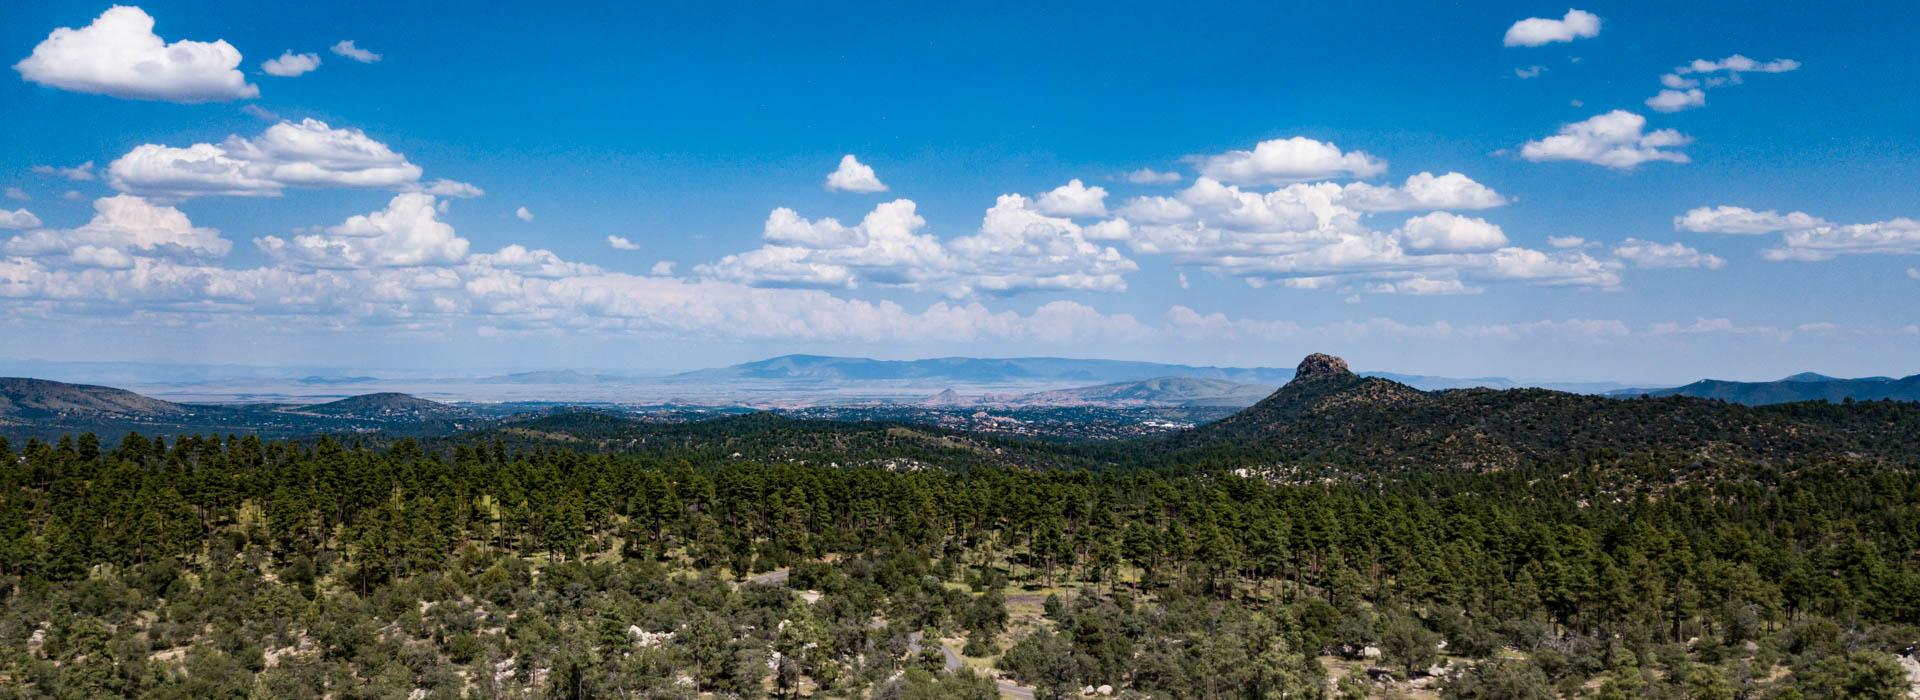 Thumb Butte Forest Service Prescott Arizona Photographer Rich Charpentier